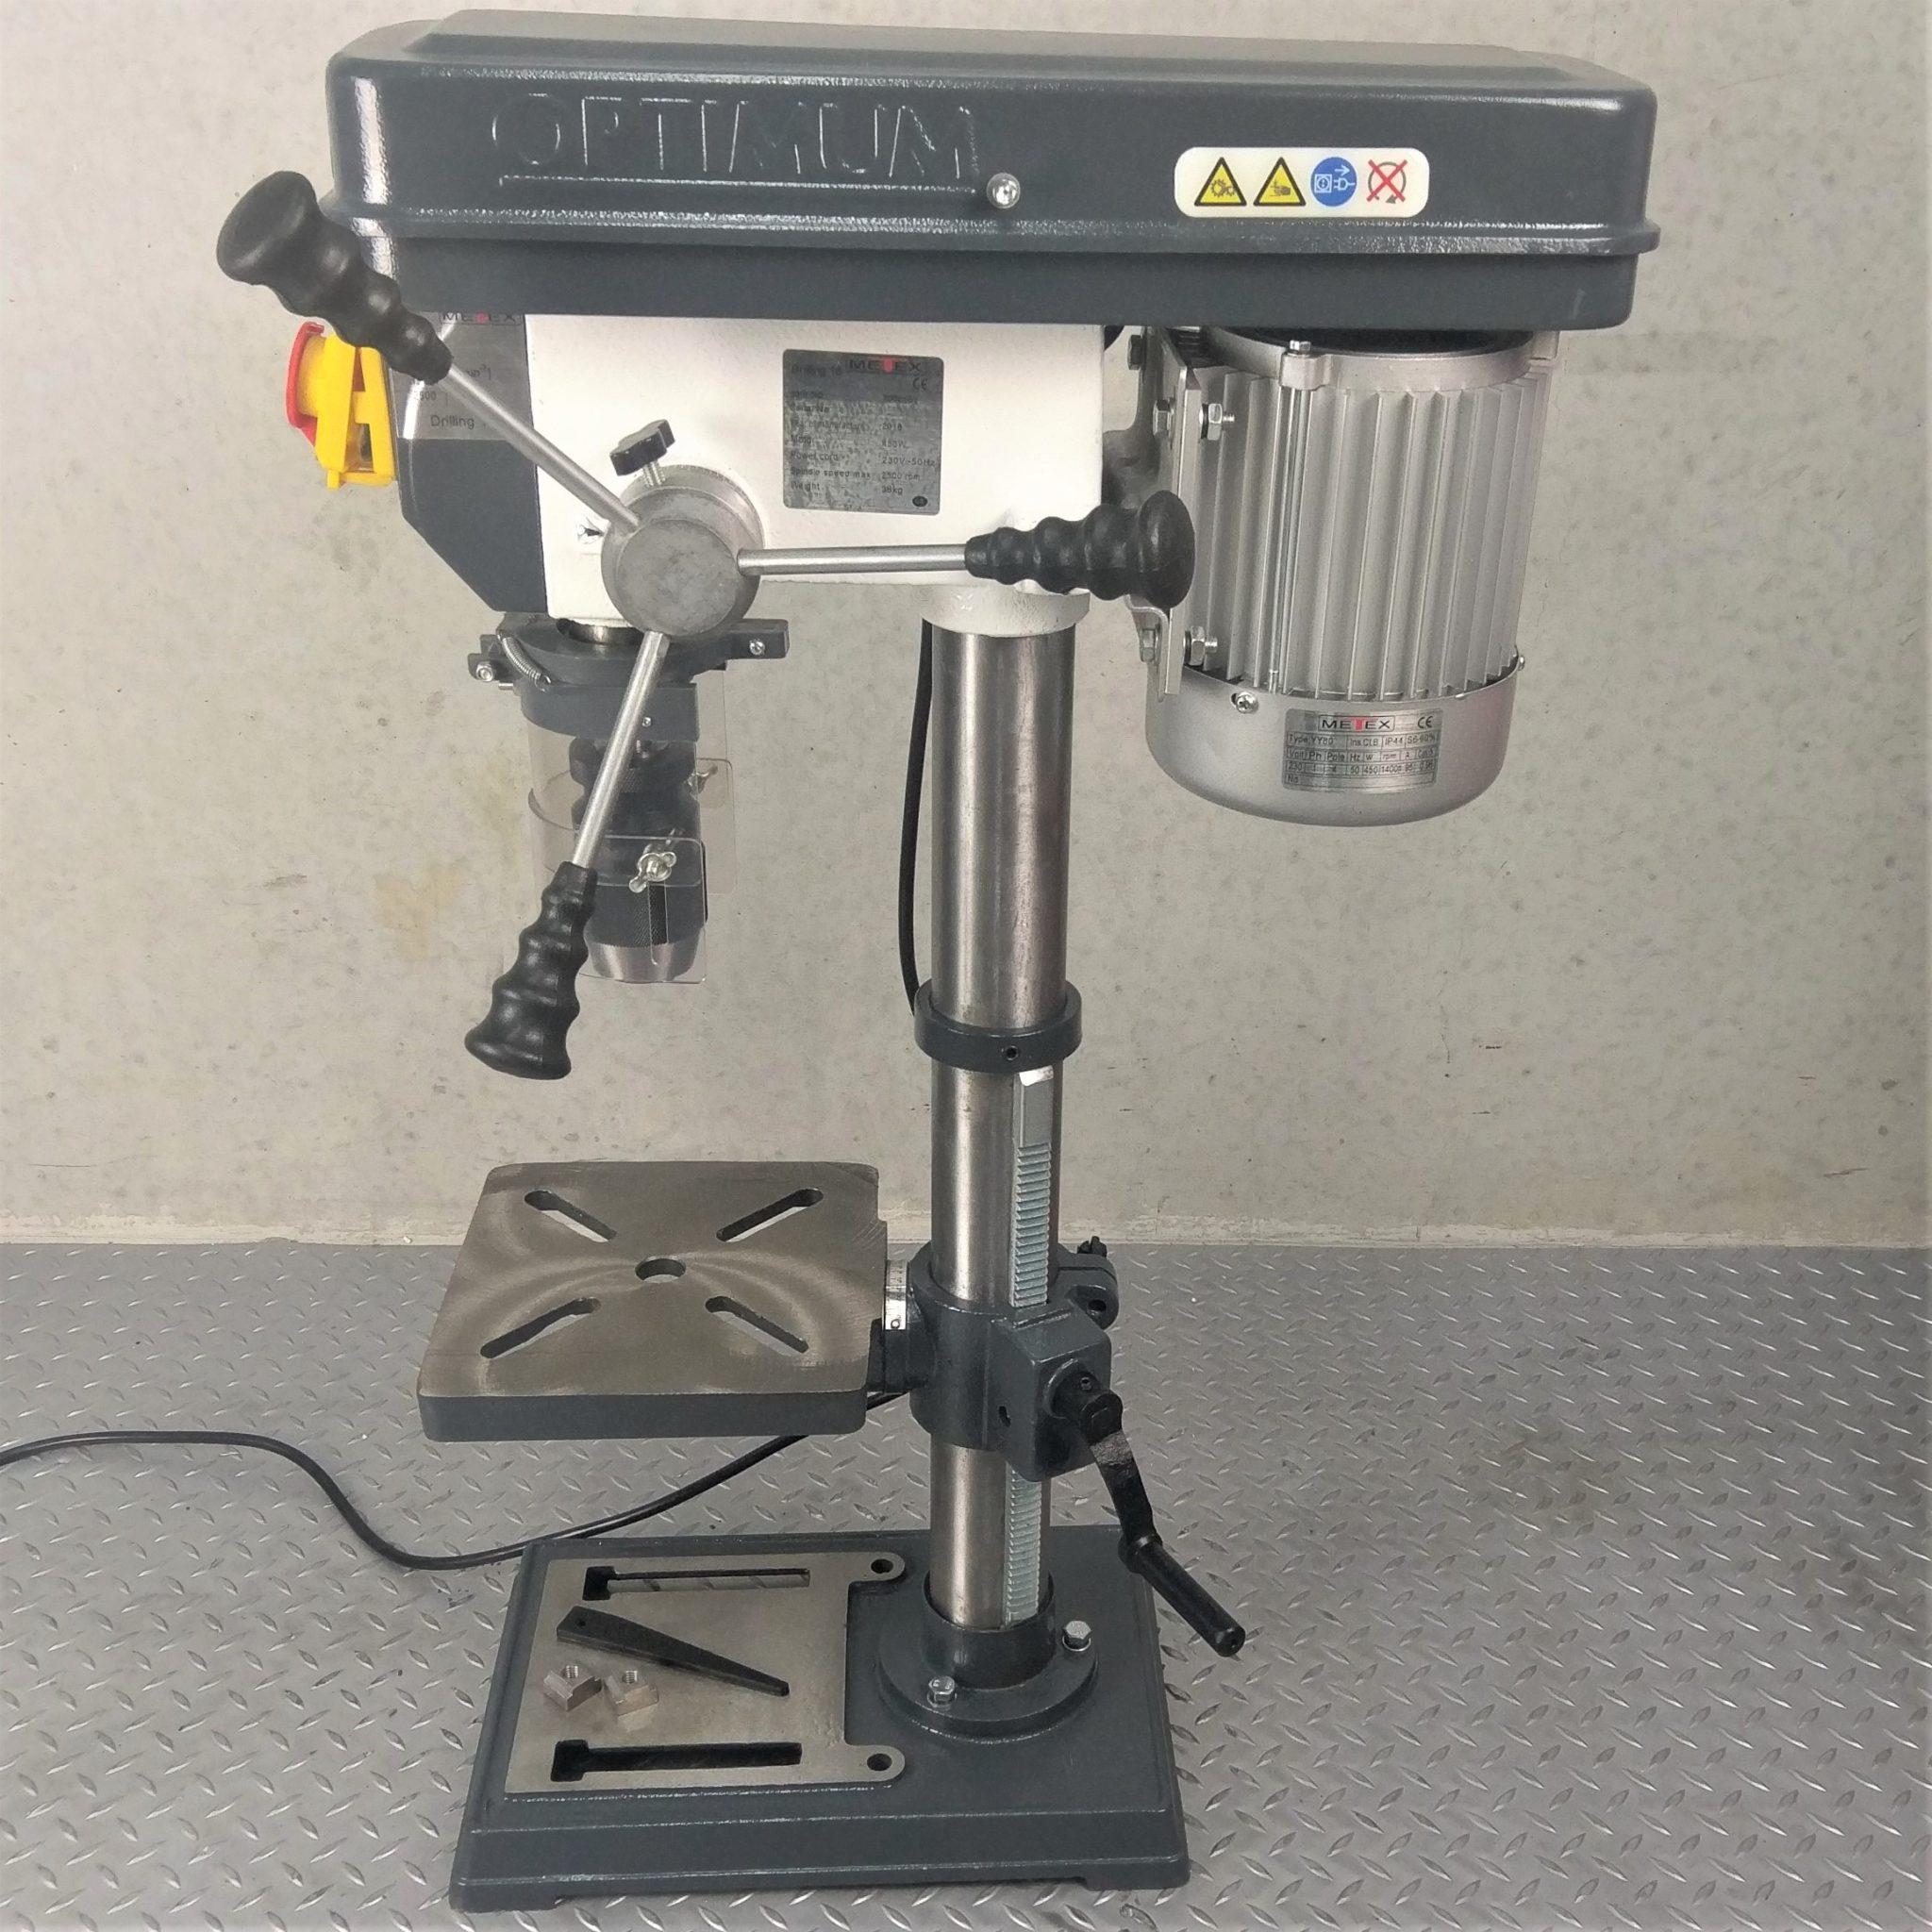 Metex By Optimum Bench Drill Press 16mm Mt2 5 Speed V